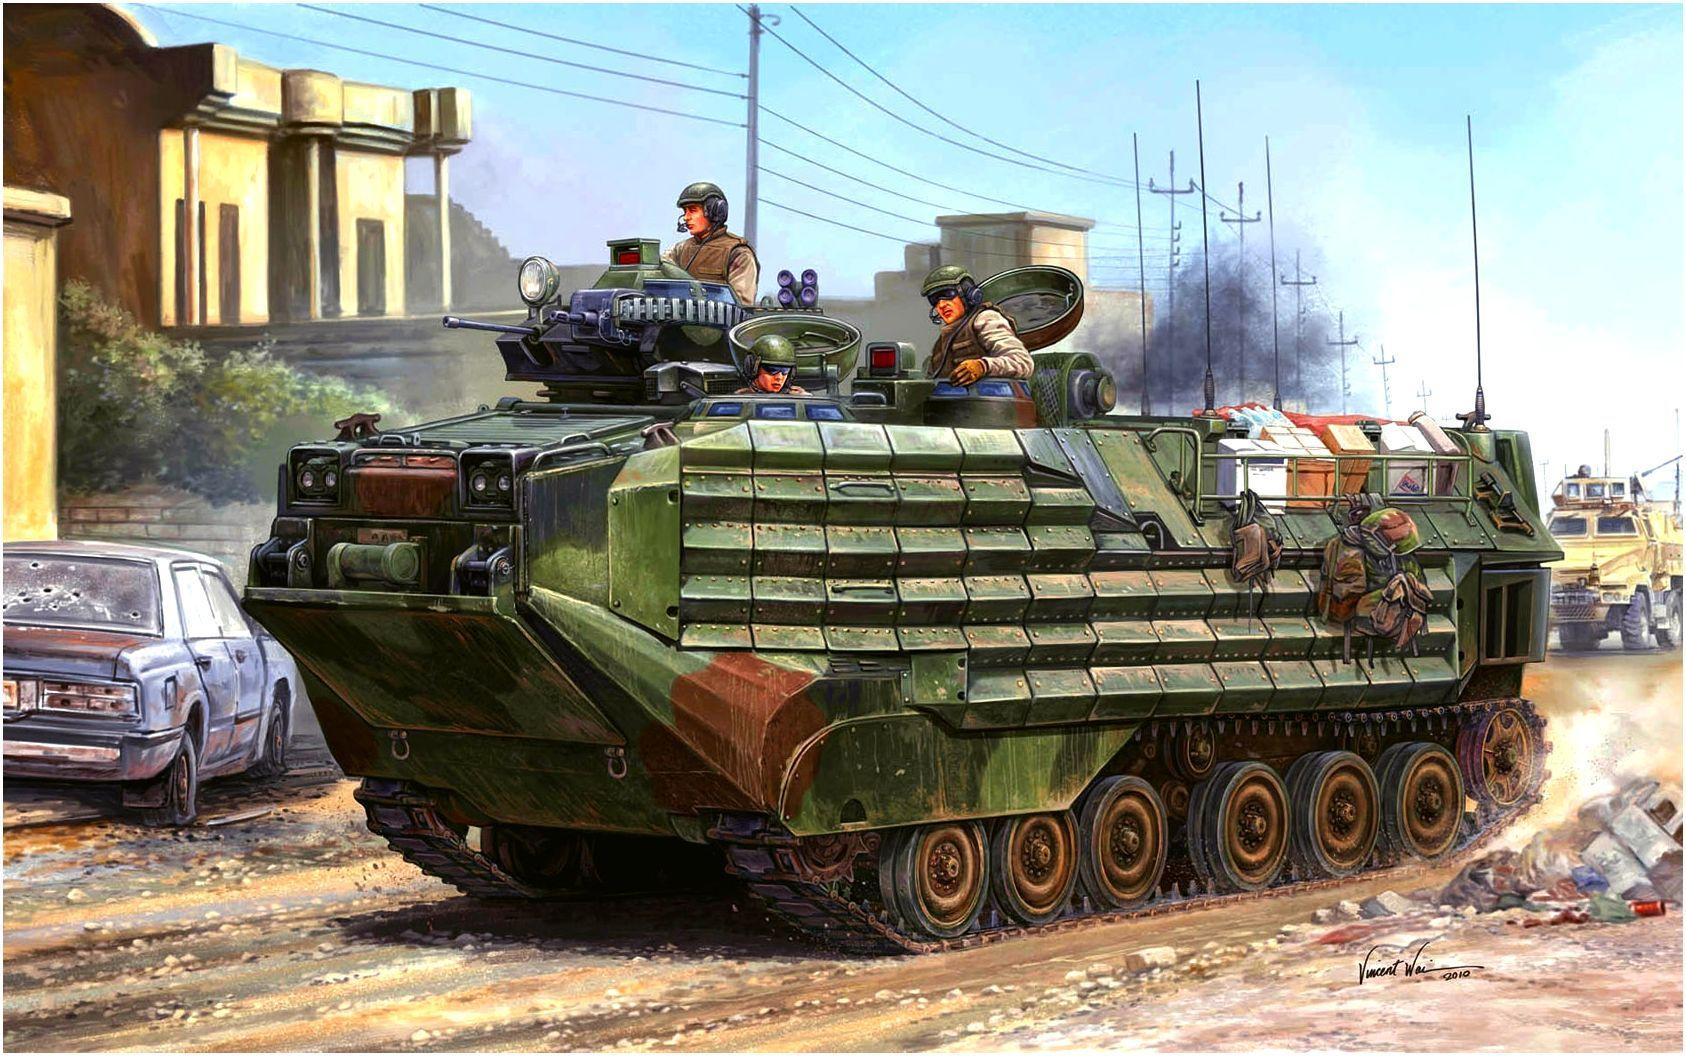 baabfa147222af75a92f660cfaa5bbc5 baghdad surge iraq wars pinterest baghdad, military art and